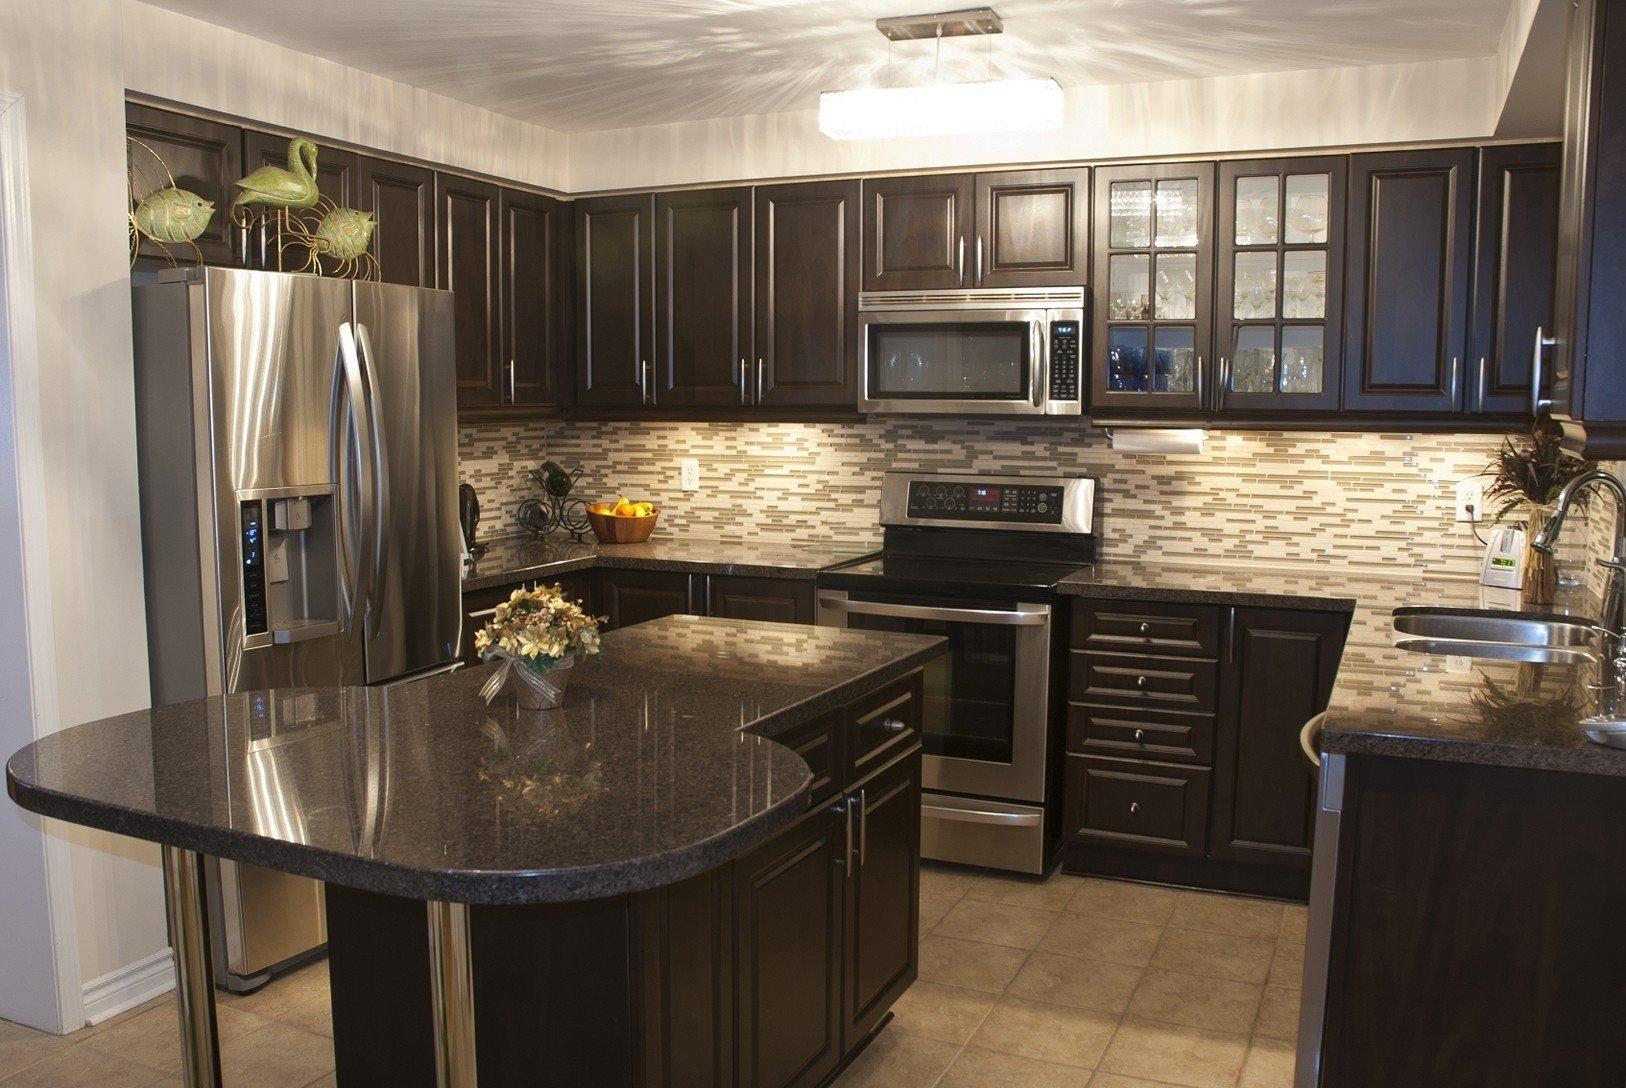 10 Pretty Kitchen Paint Ideas With Dark Cabinets best kitchen paint colors with dark cabinets 2020